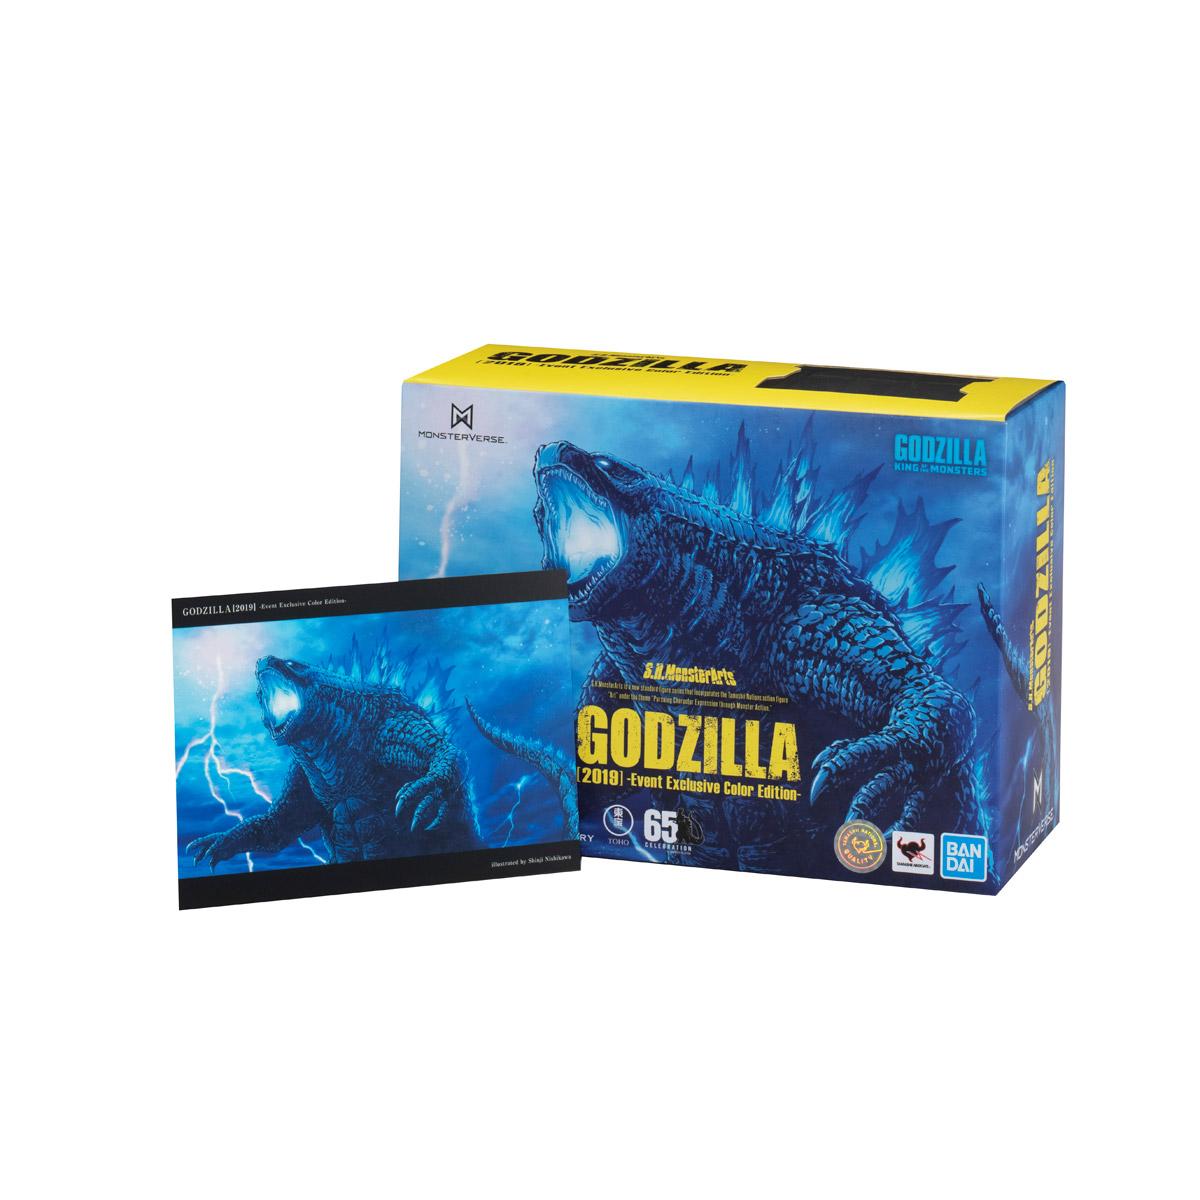 S.H.MonsterArts GODZILLA 【2019】 -Event Exclusive Color Edition-